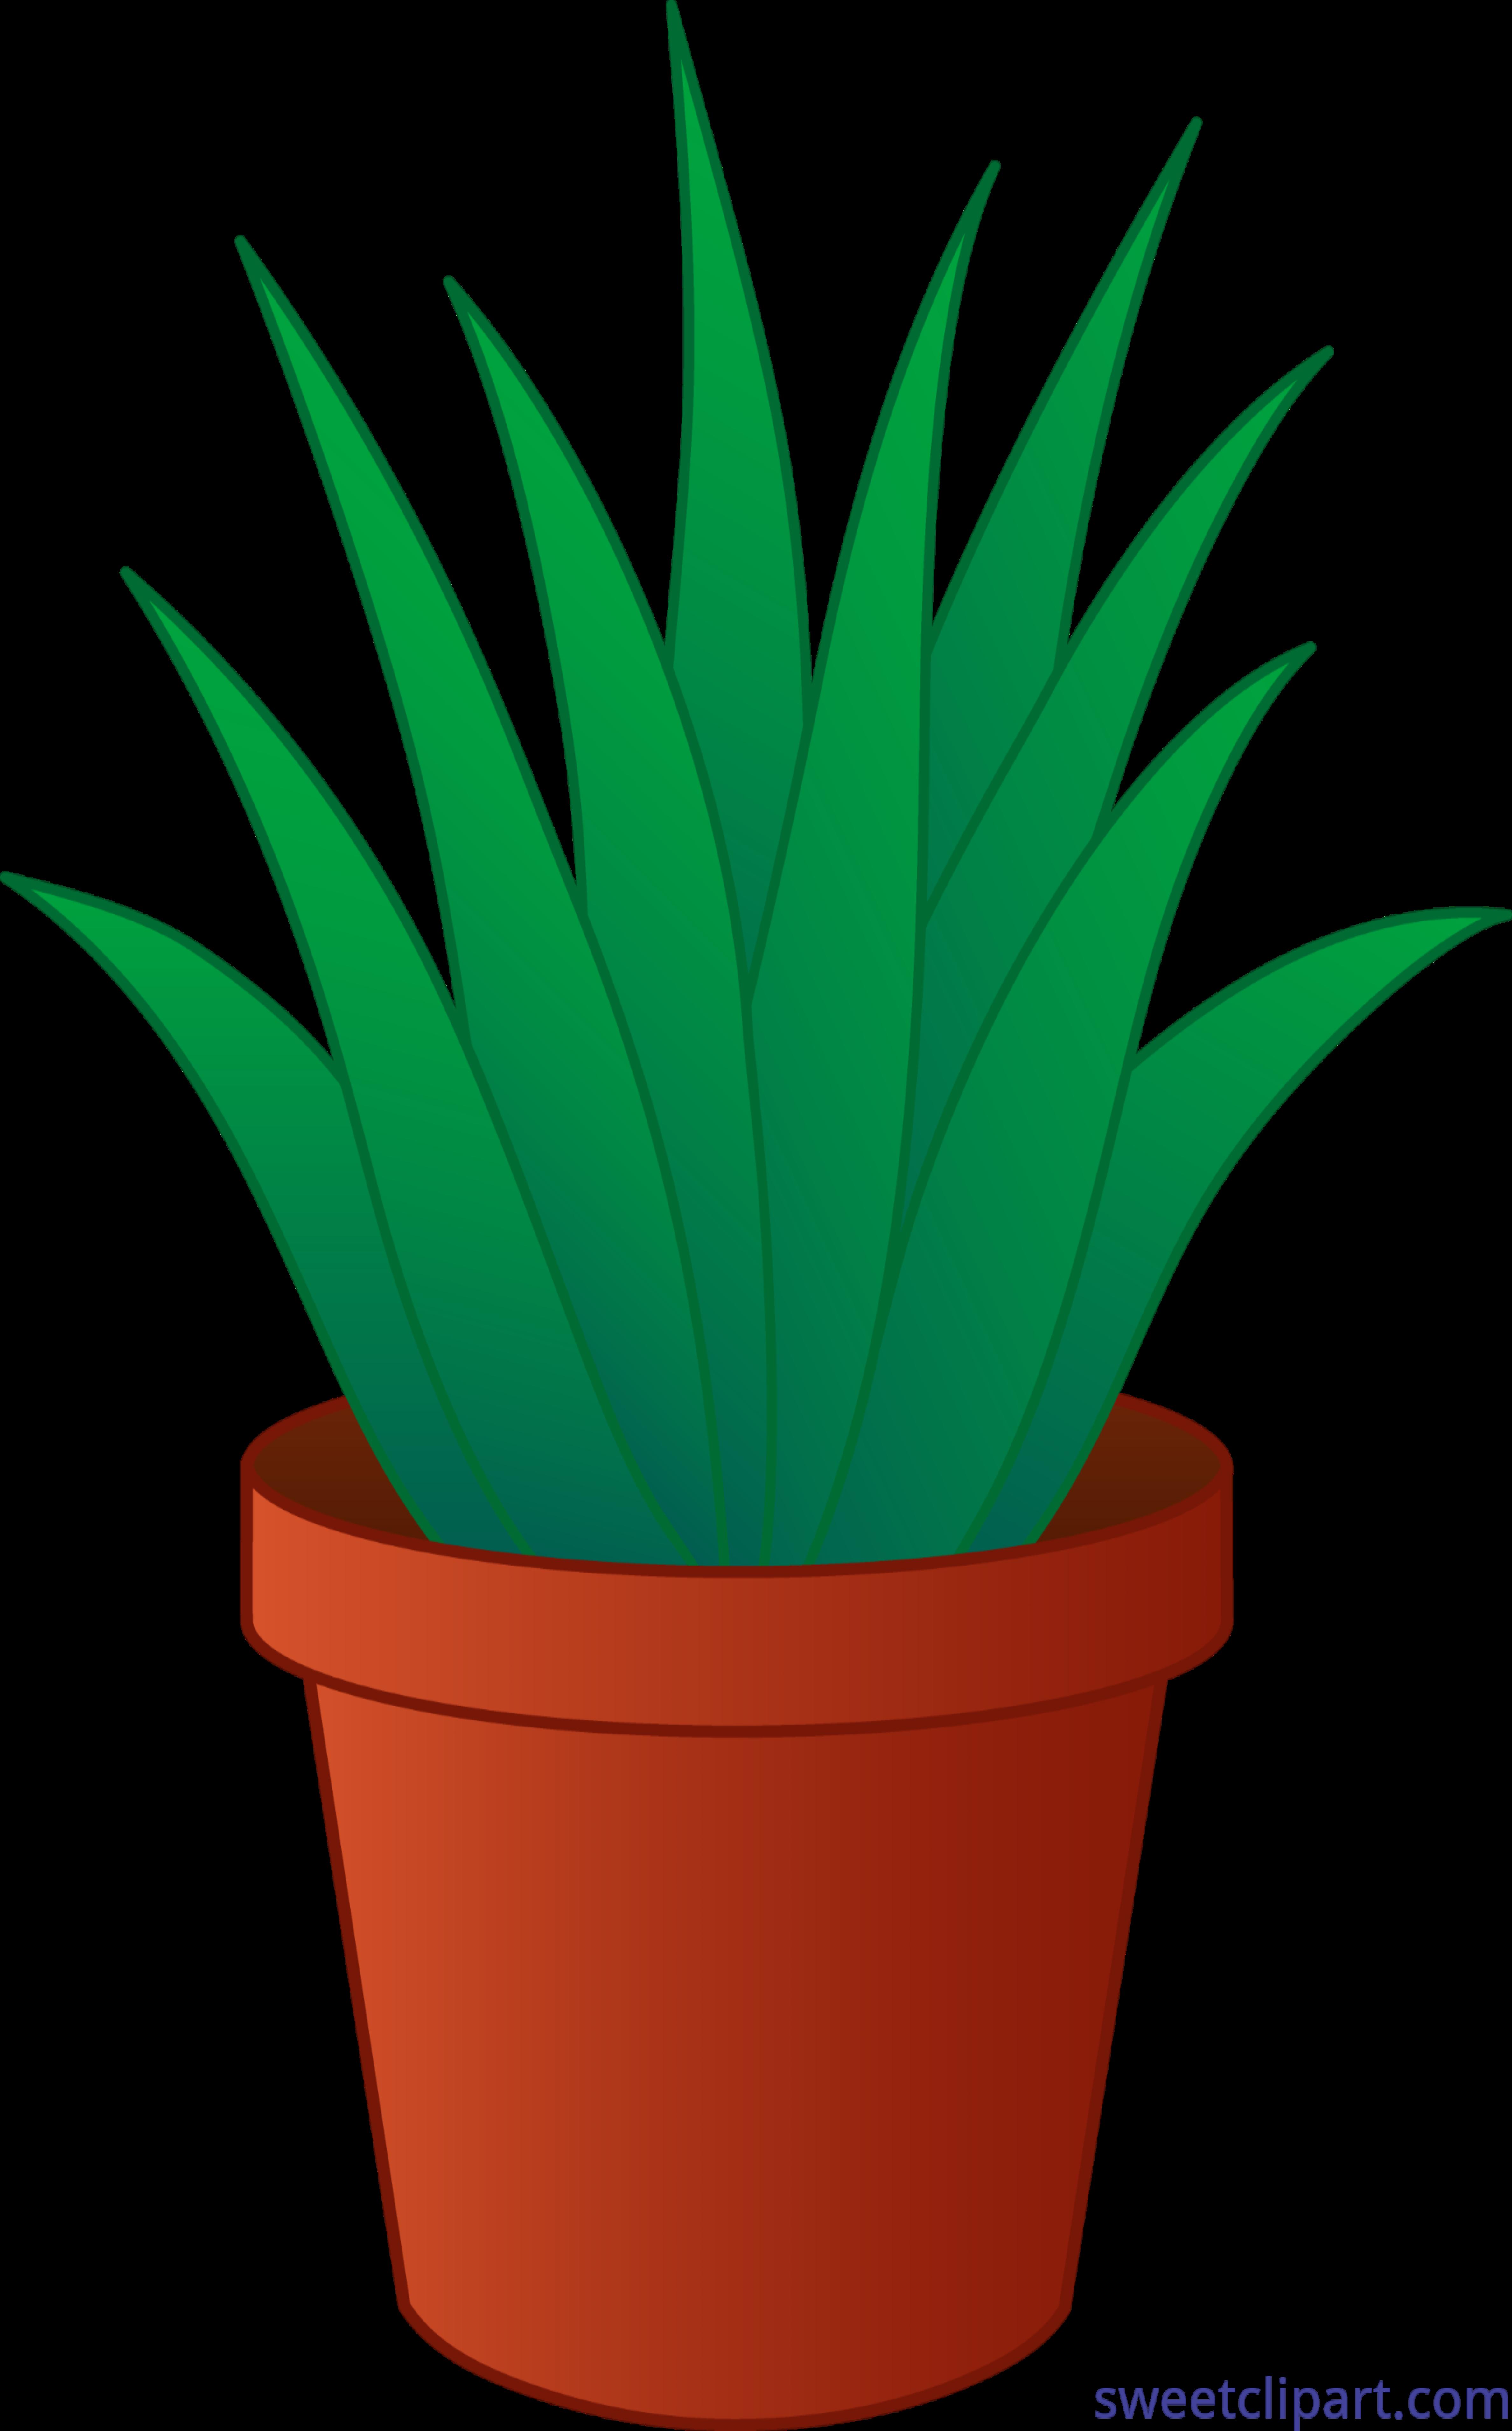 Marijuana clipart tropical plant. Pot drawing at getdrawings